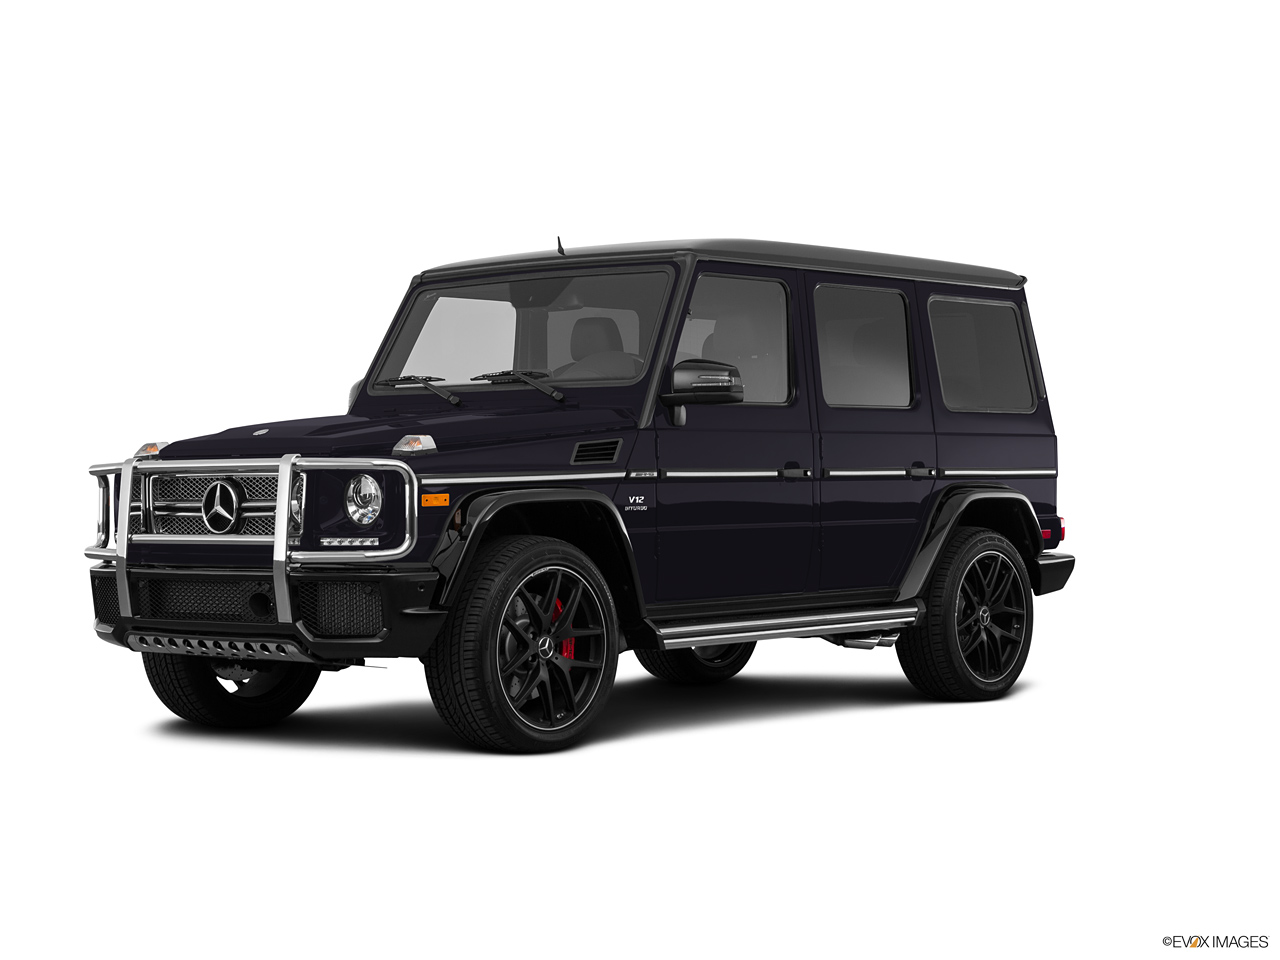 Mercedes benz g class price in qatar new mercedes benz g for Mercedes benz g class truck price